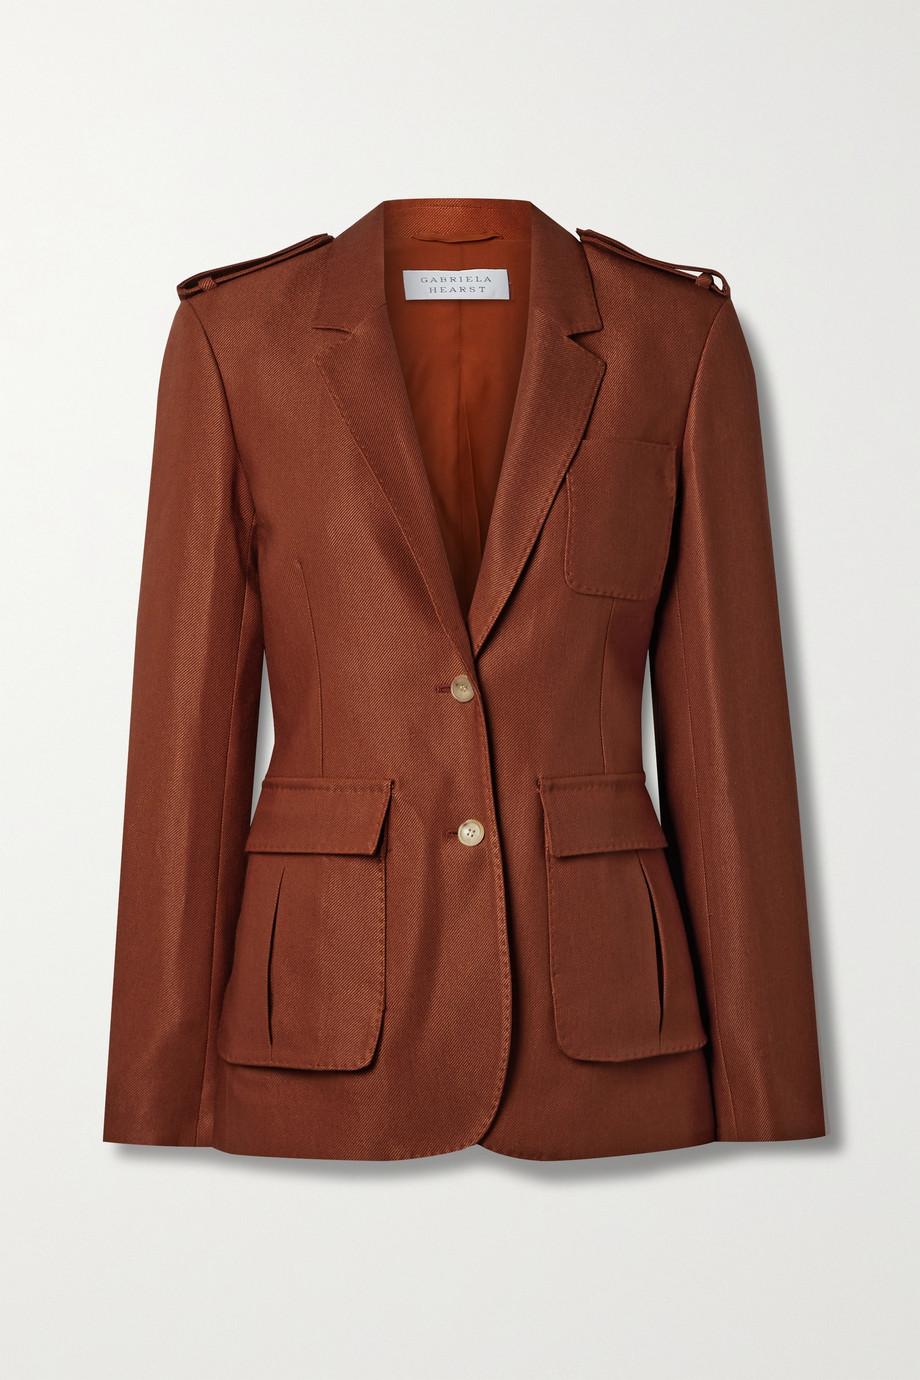 Gabriela Hearst Louisa wool and silk-blend twill blazer